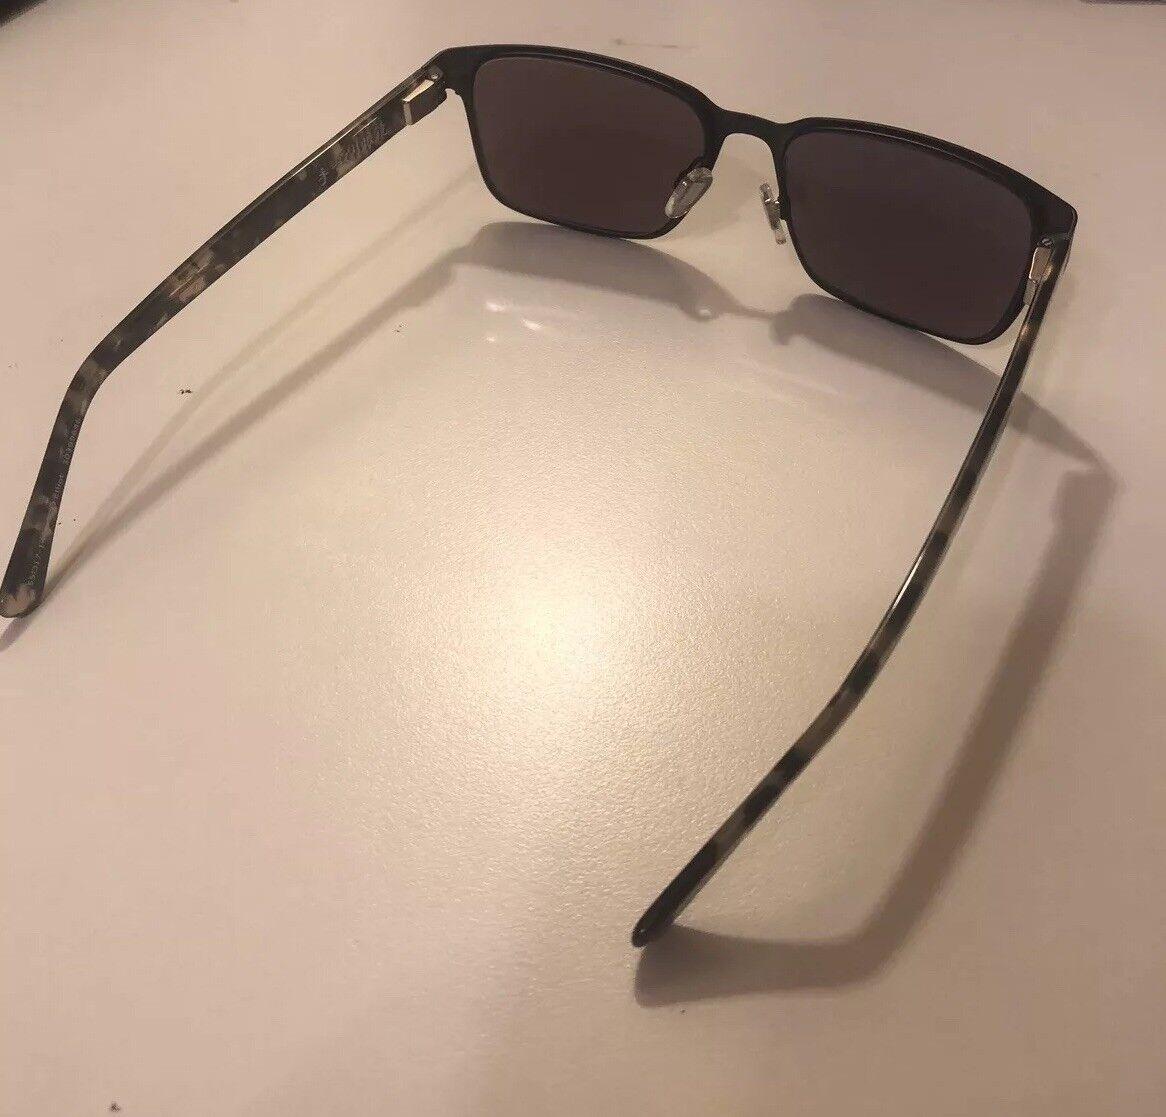 8d4b561d3e8 Authentic Versace Ve 2054 Sunglasses 1001 87 Black Red Grey Ve2054 2o54 for  sale online